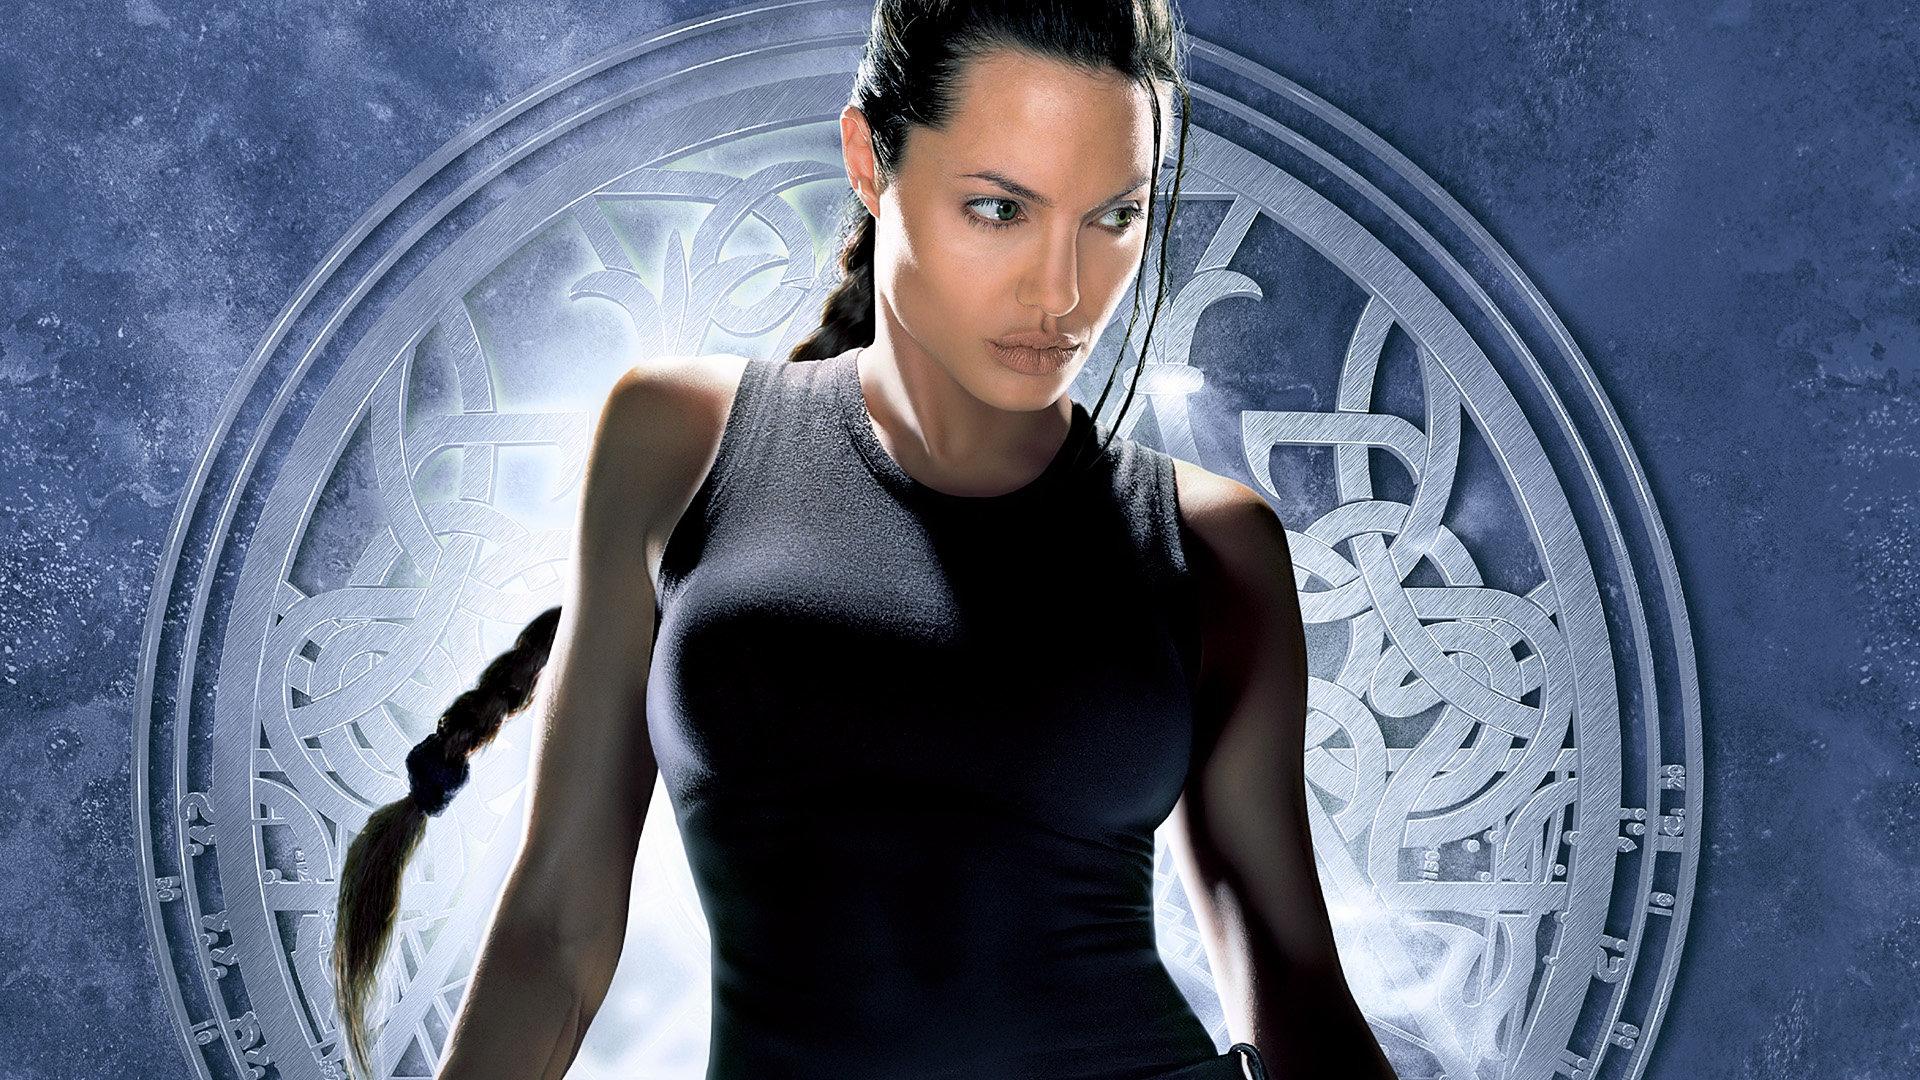 High Resolution Lara Croft Tomb Raider Movie Full Hd 1080p